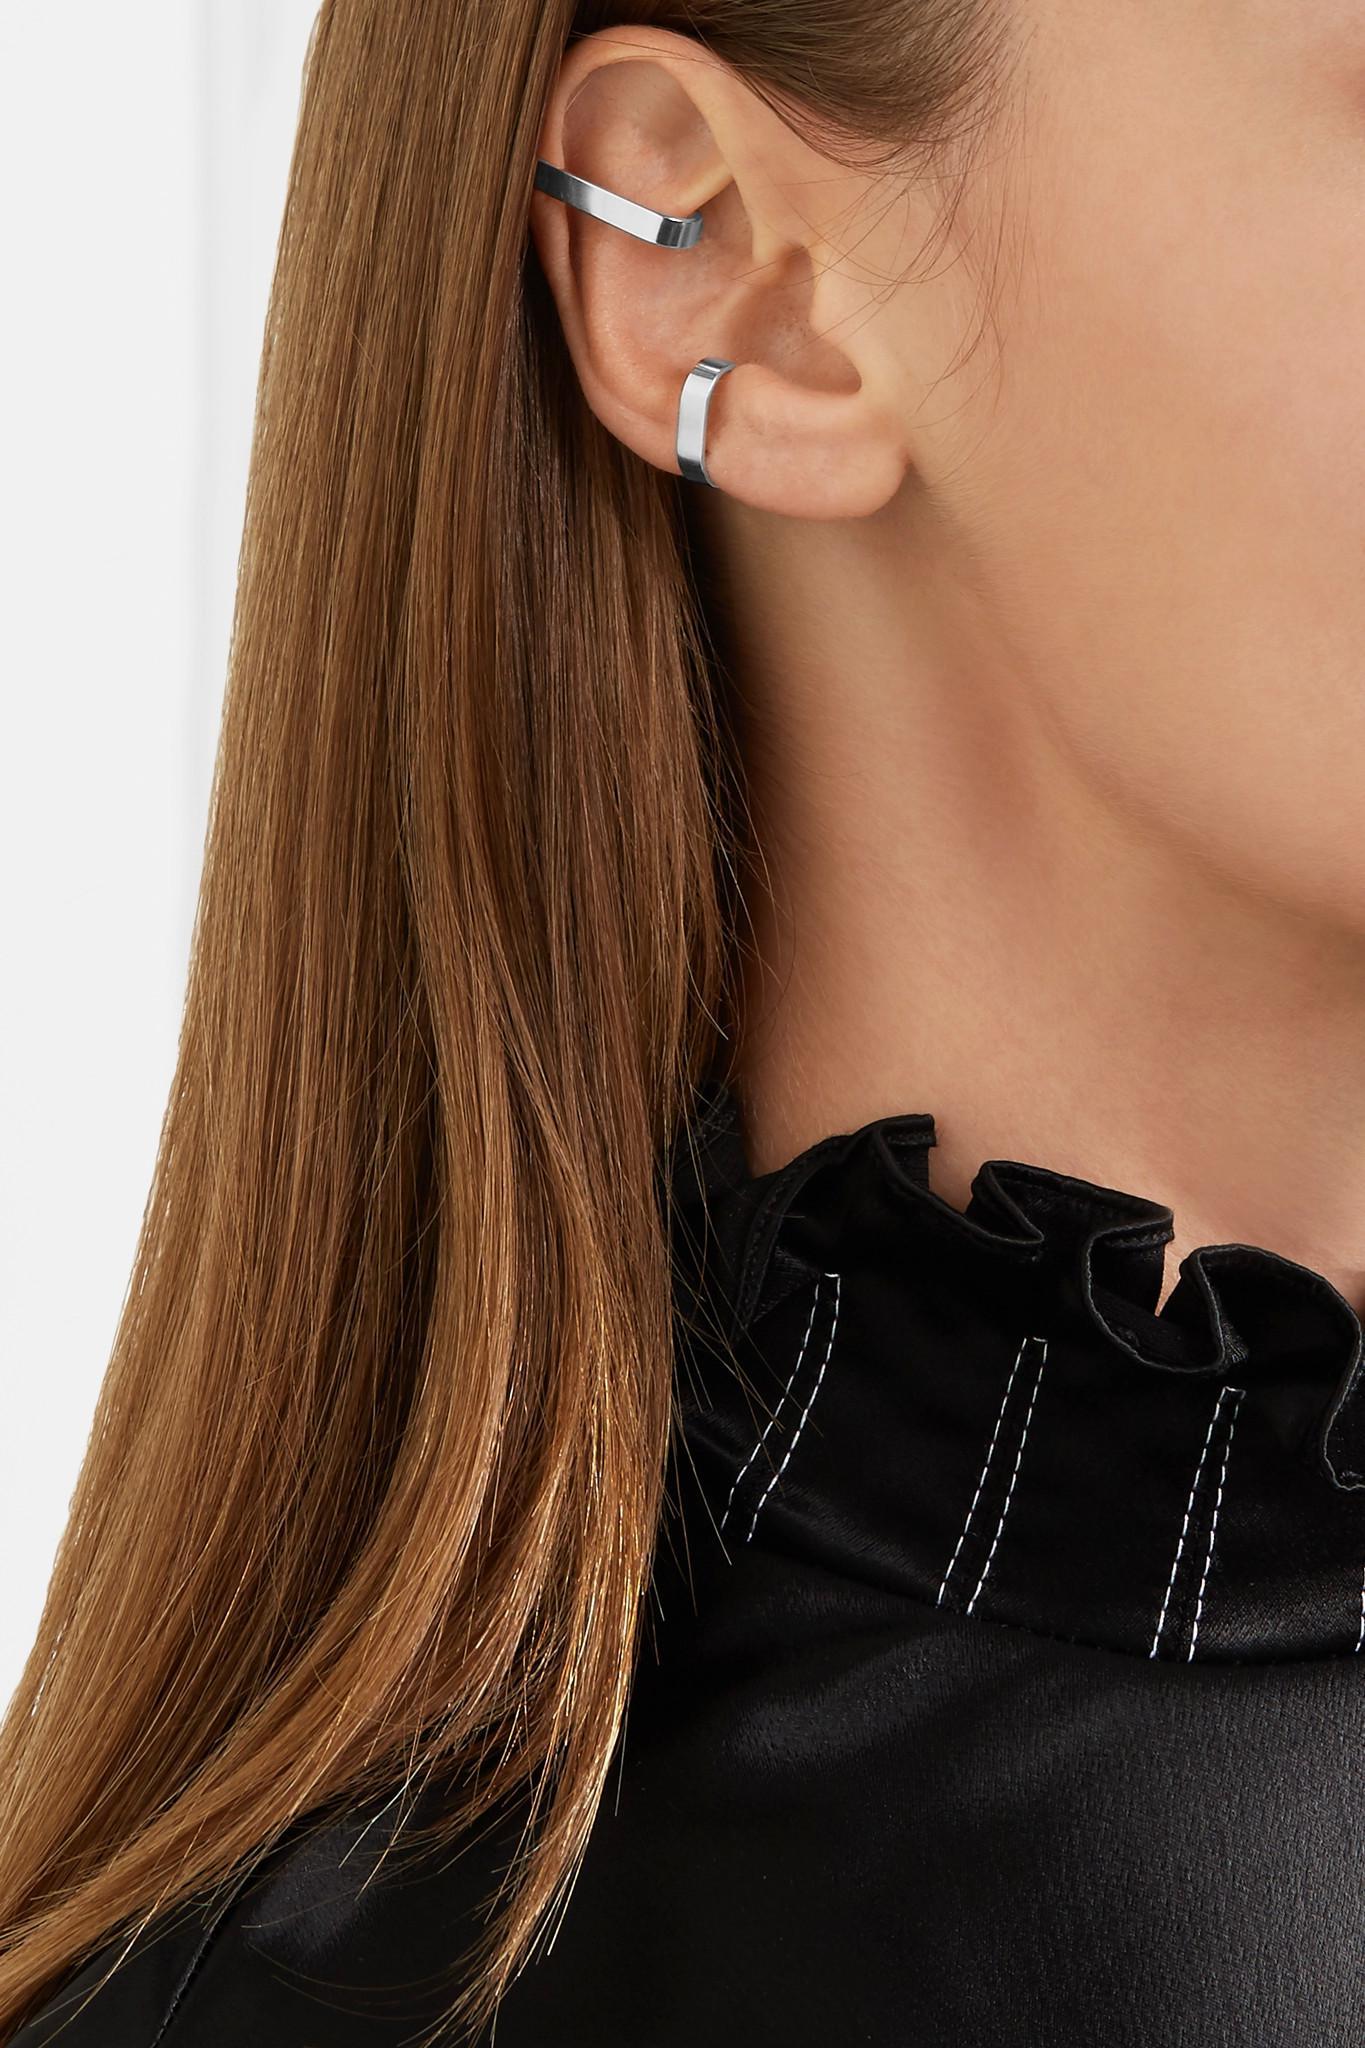 Saskia Diez X Stripe Set Of Two Silver Ear Cuffs H1nNH